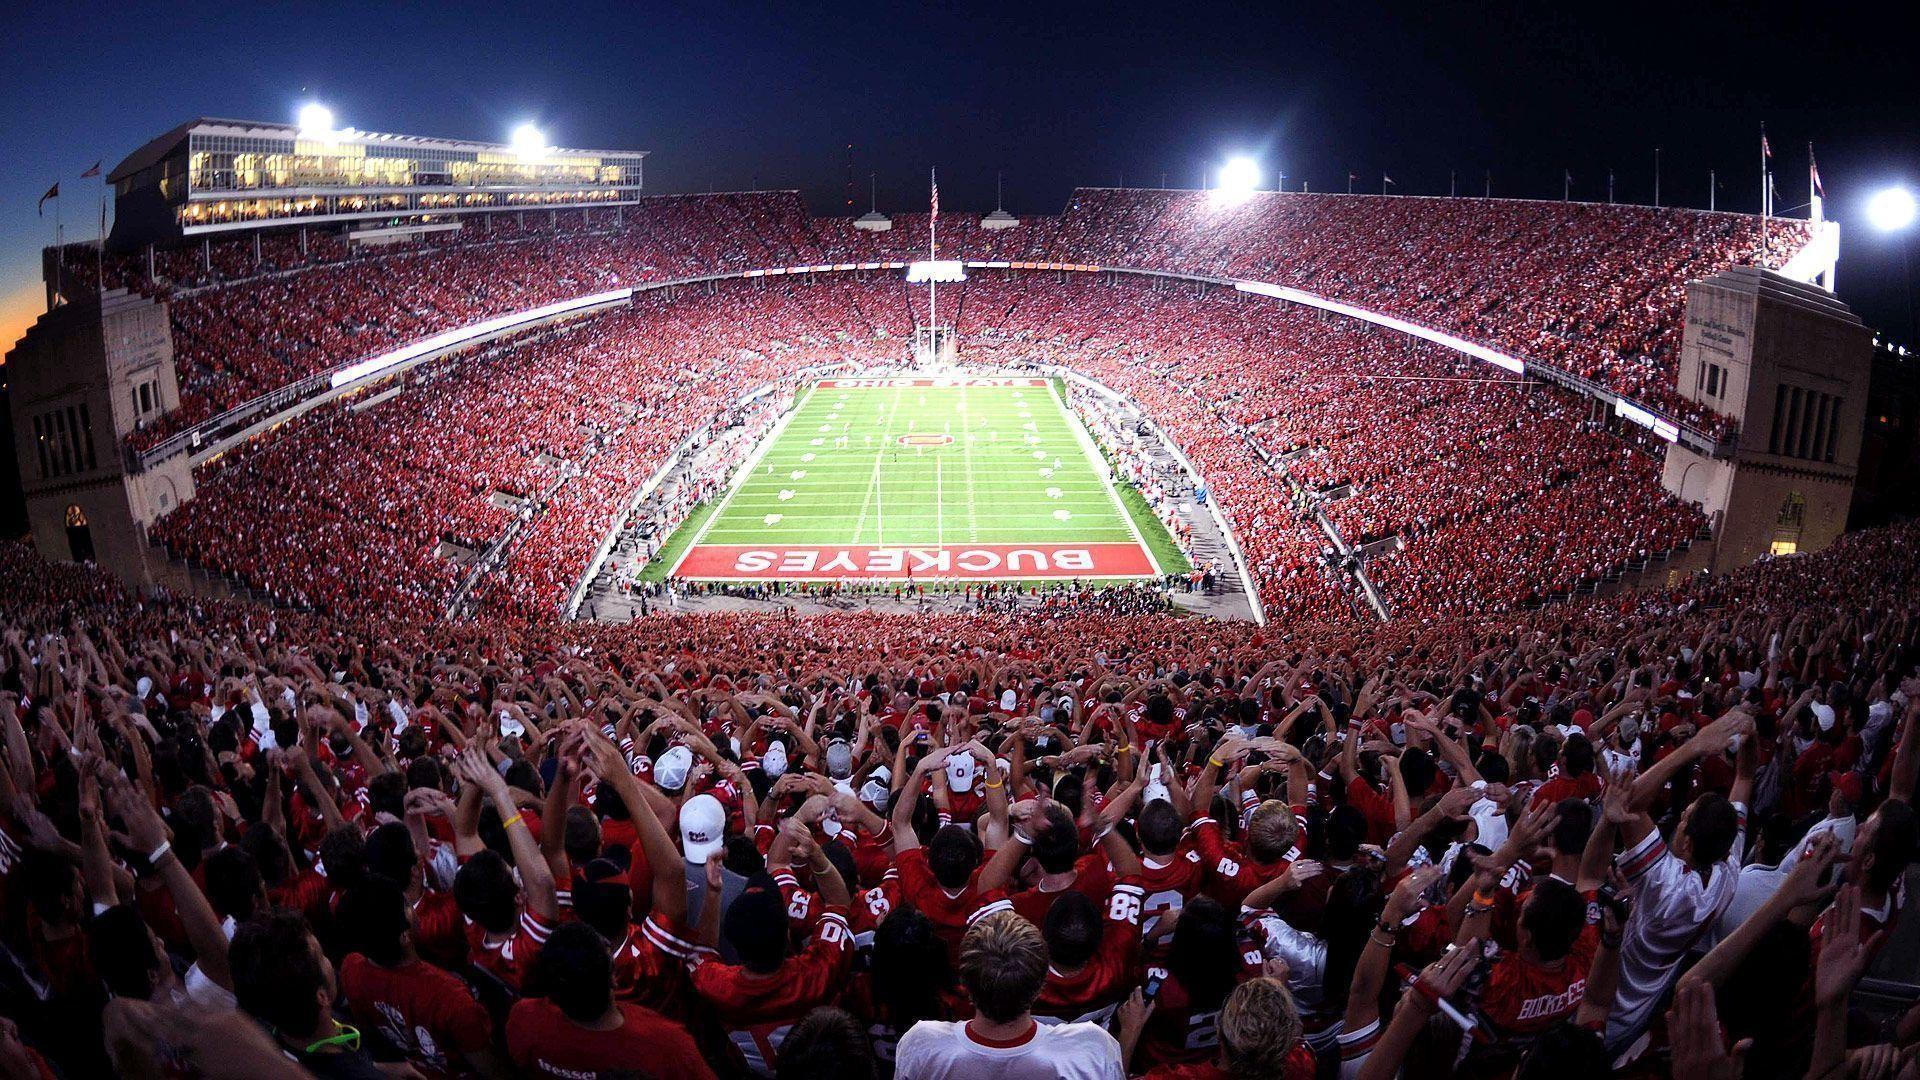 Ohio State Football Stadium Wallpaper – Viewing Gallery